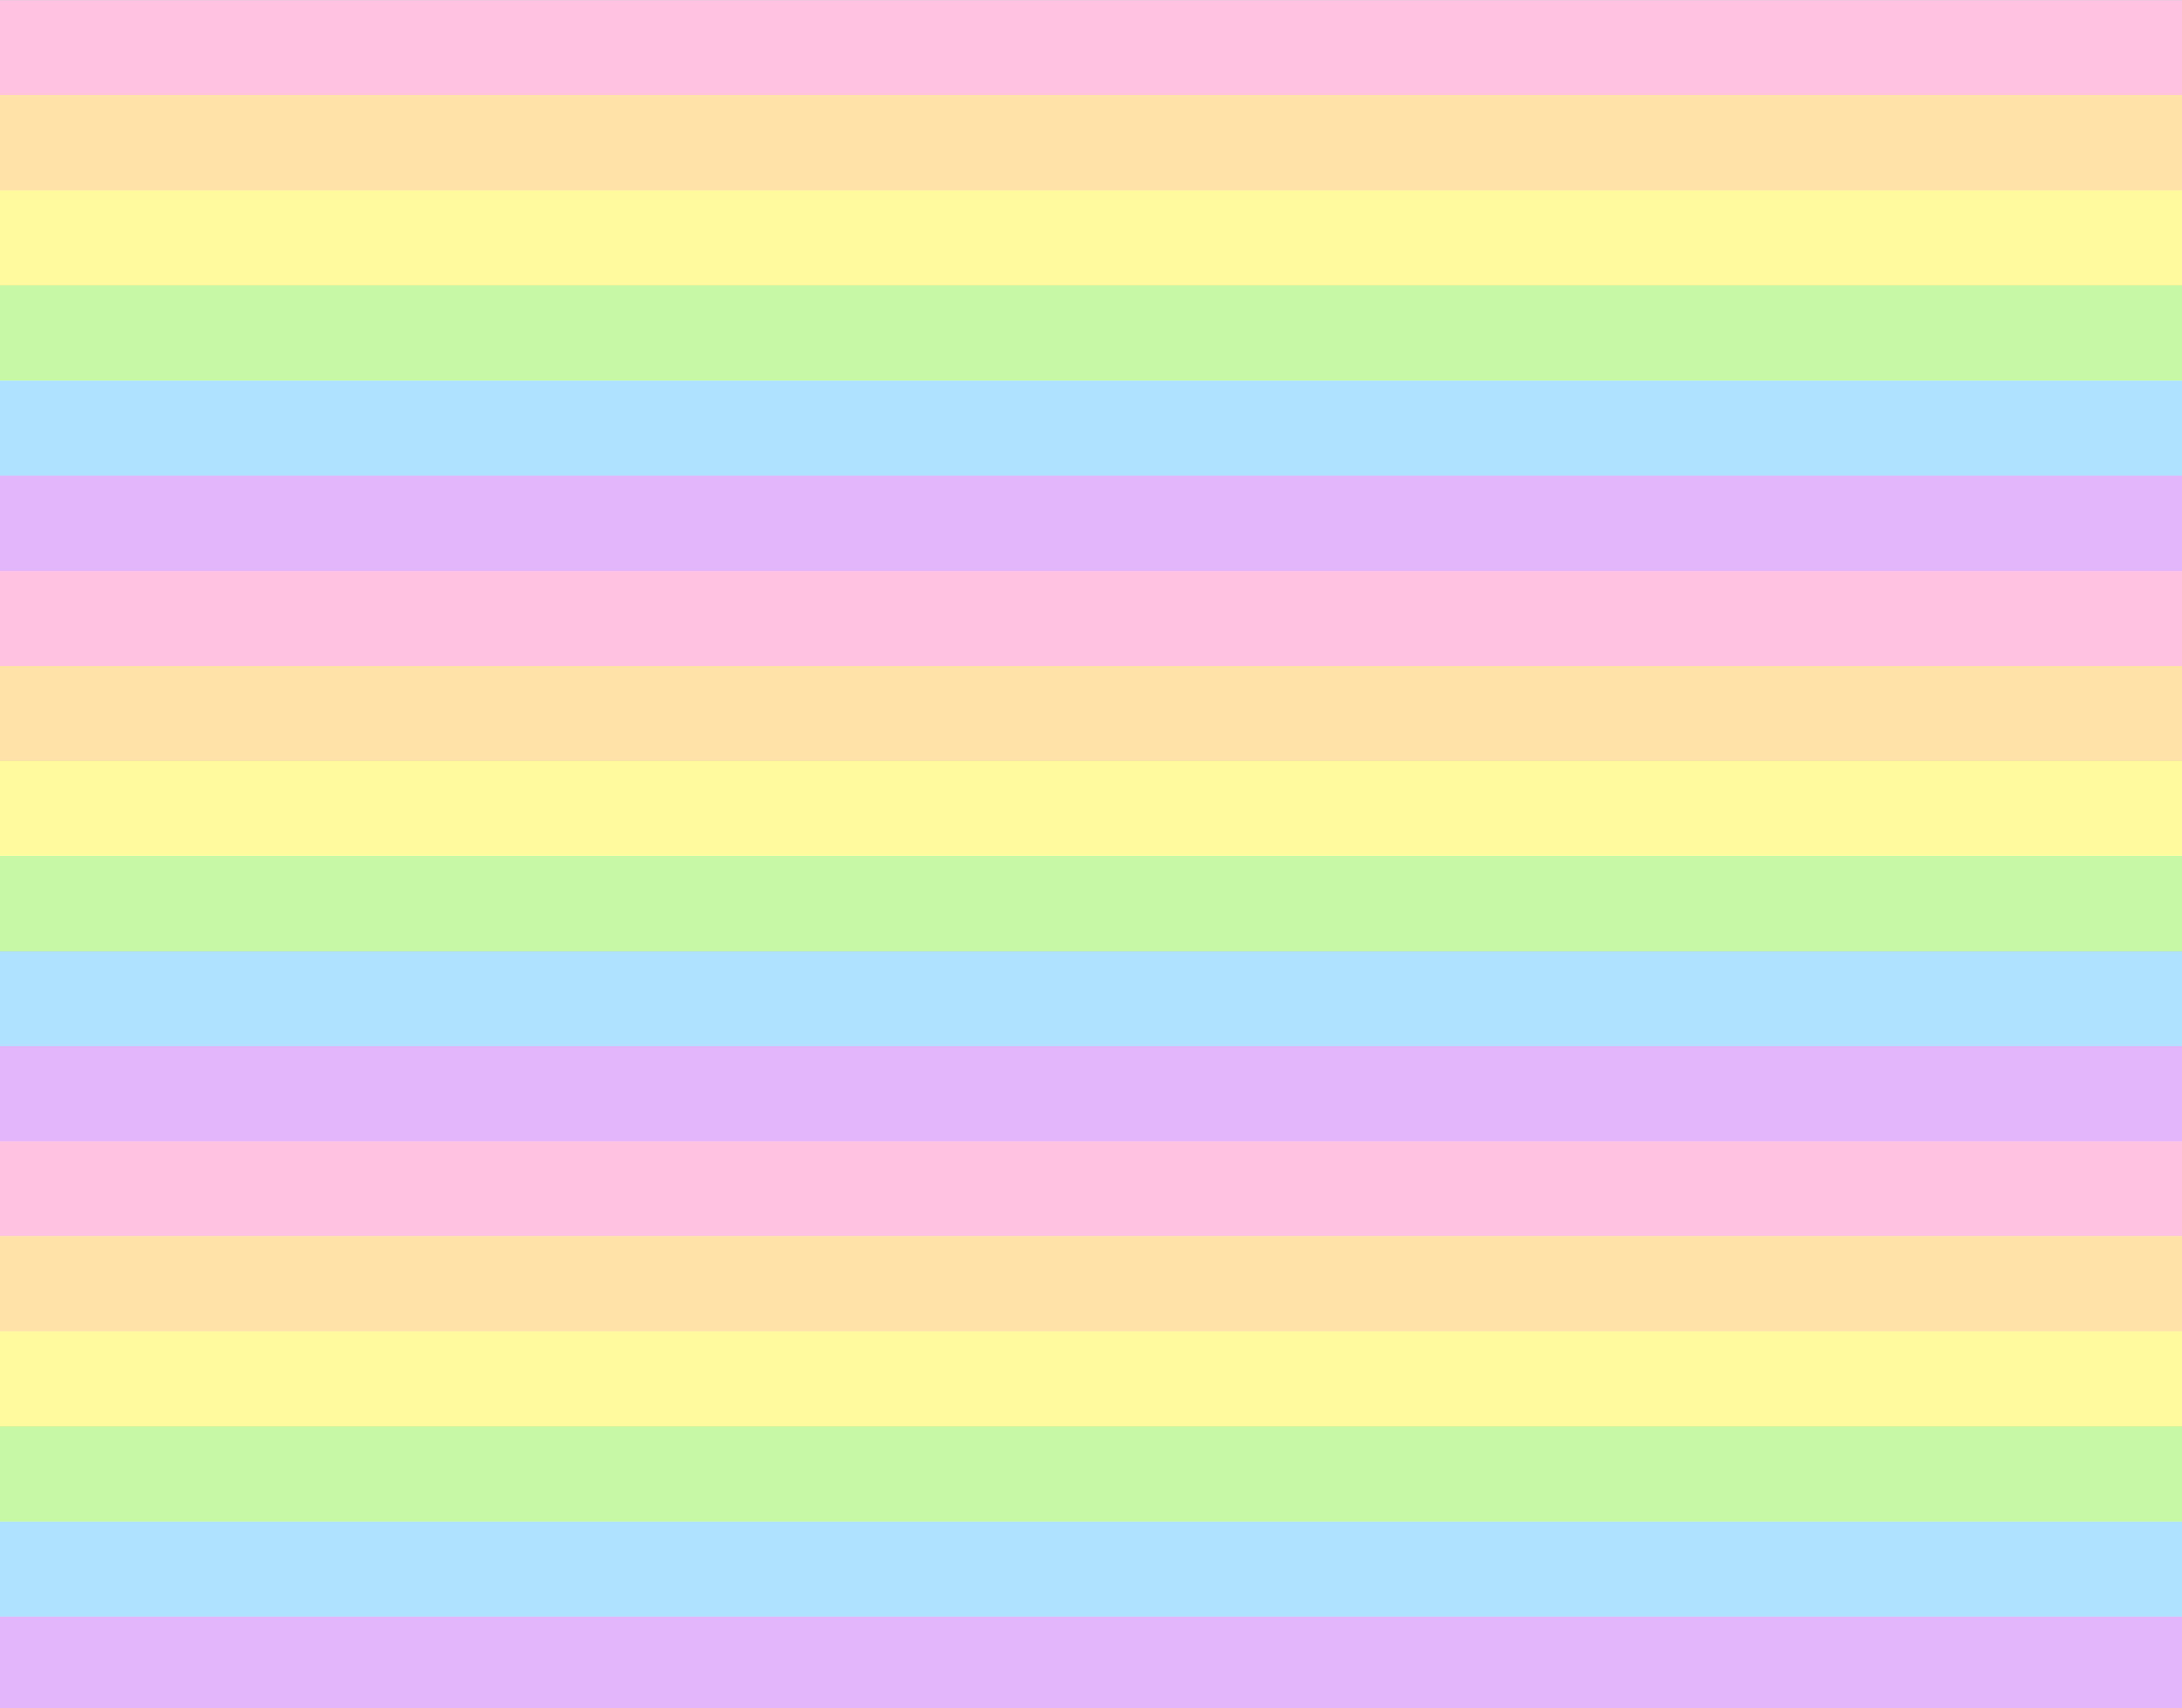 Pastel rainbow clipart vector library Cute Pastel Rainbow Striped Pattern - Free Clip Art vector library